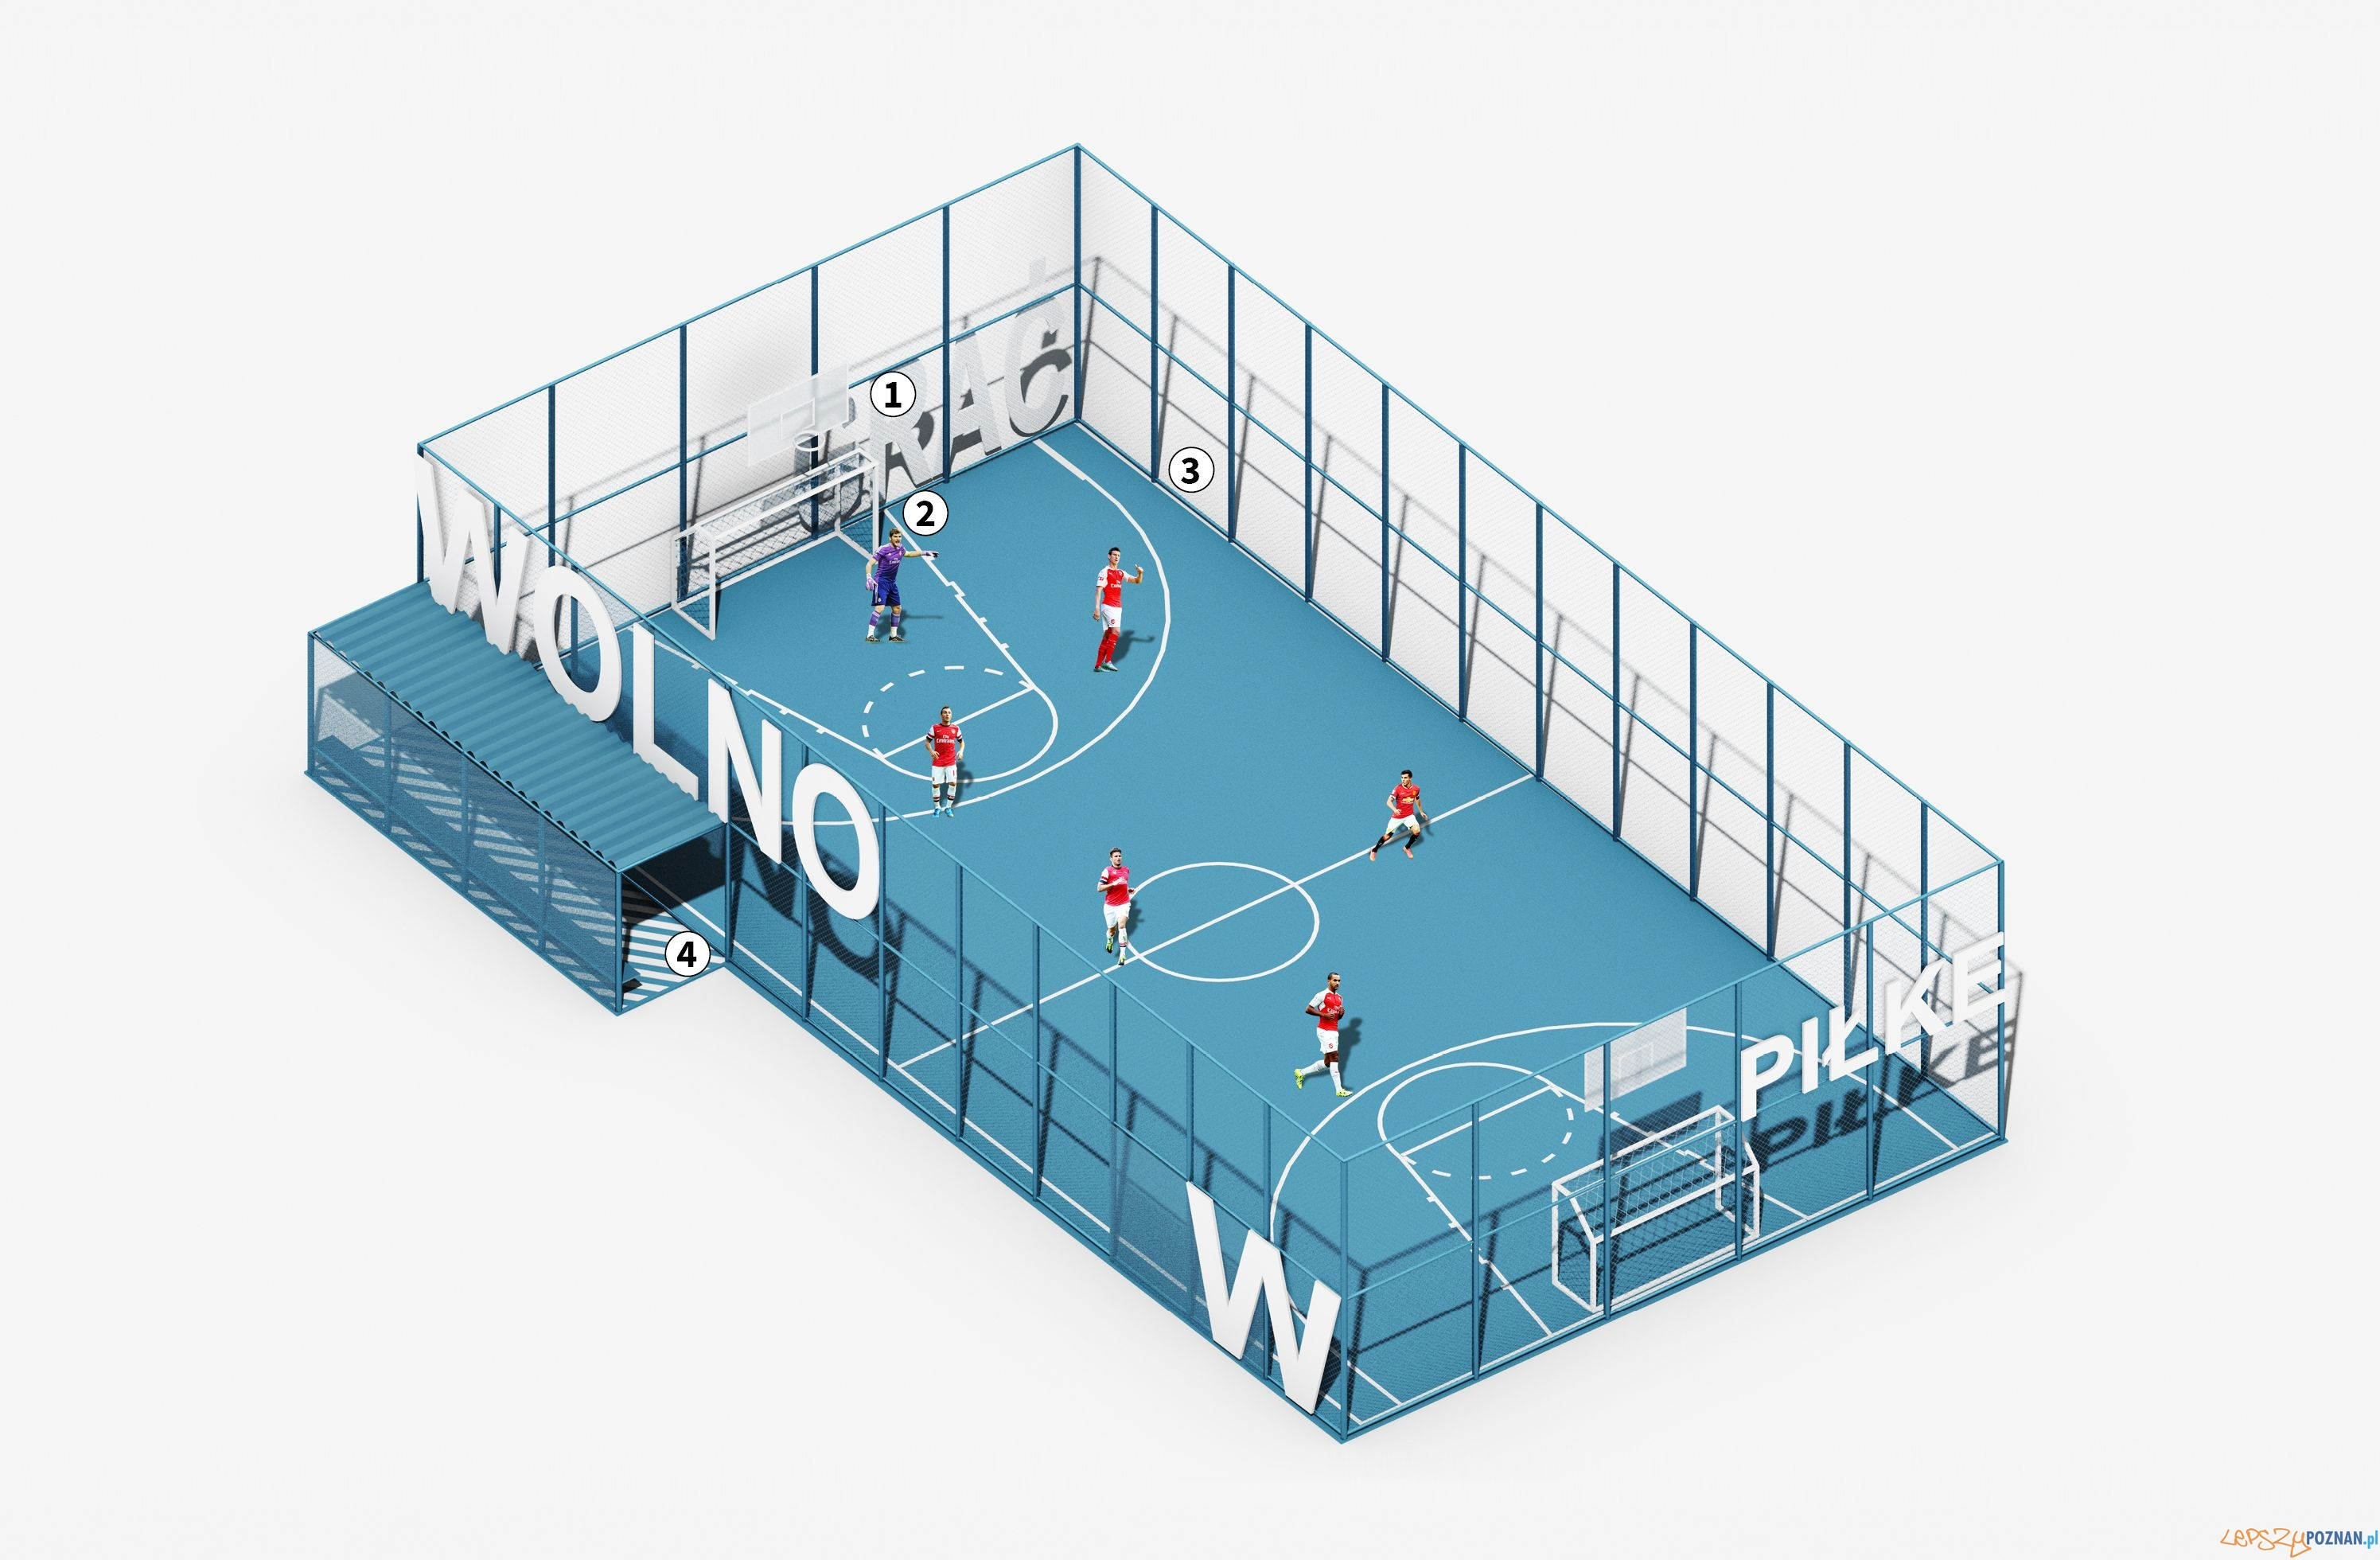 Tu WOLNO - nowy Ogrod Jordanowski - mat. UGO Architecture (7)  Foto: